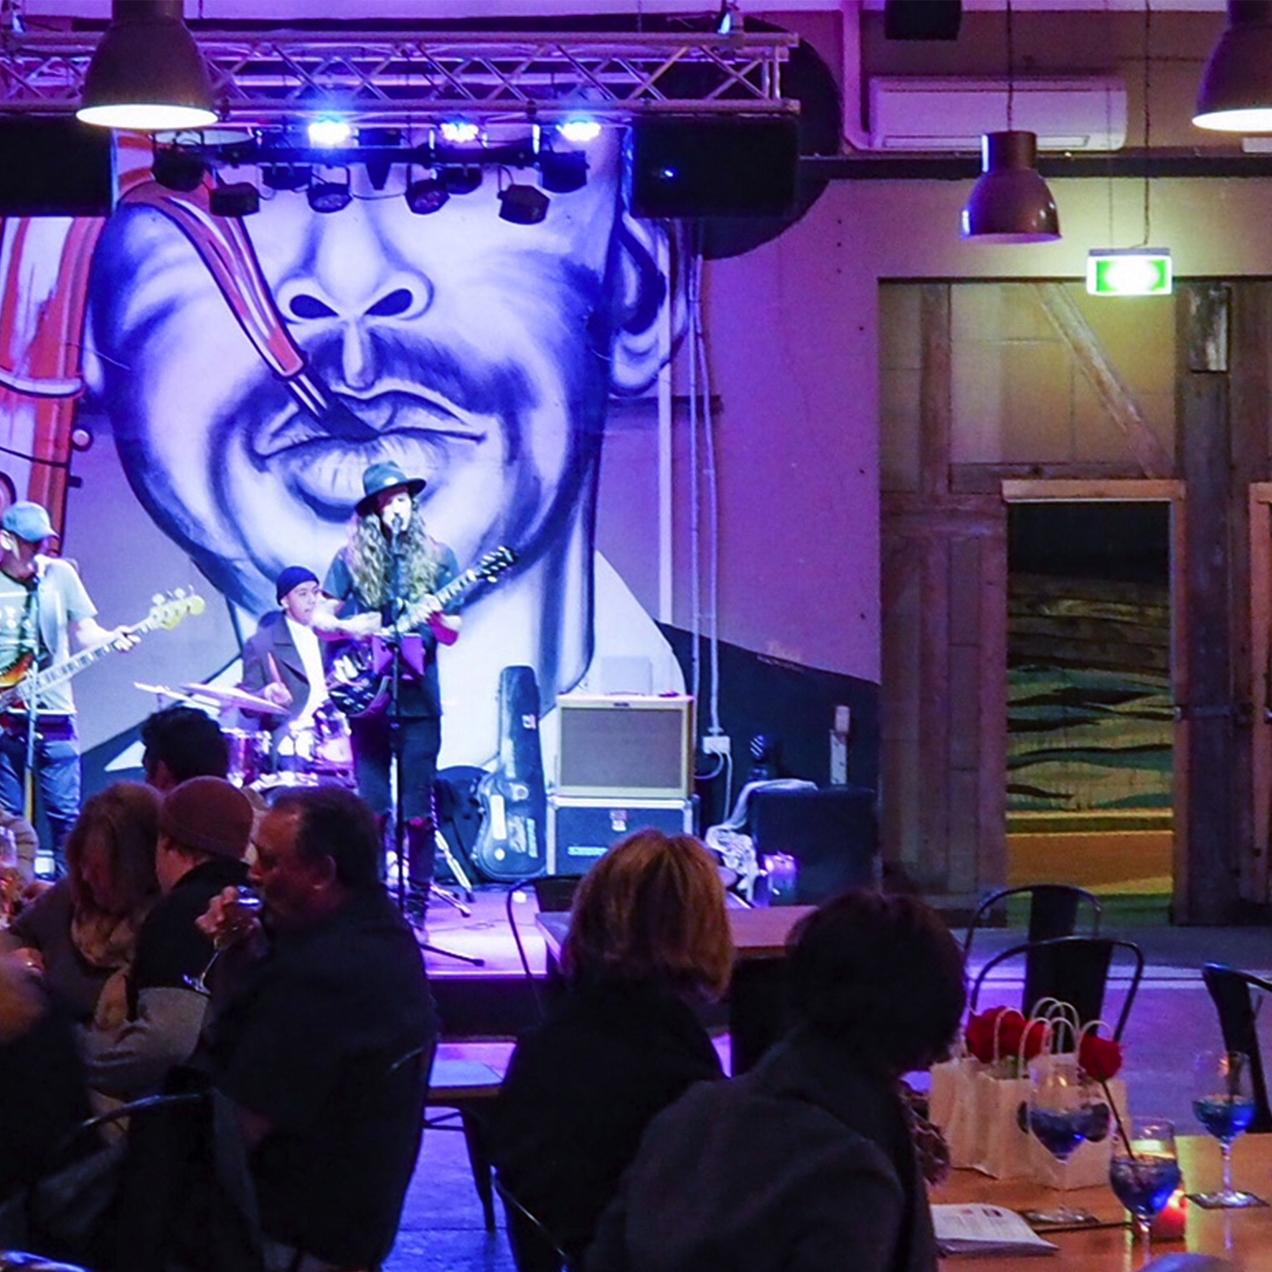 Chamber Bar / Restaurant / Cafe & Live Music Venue